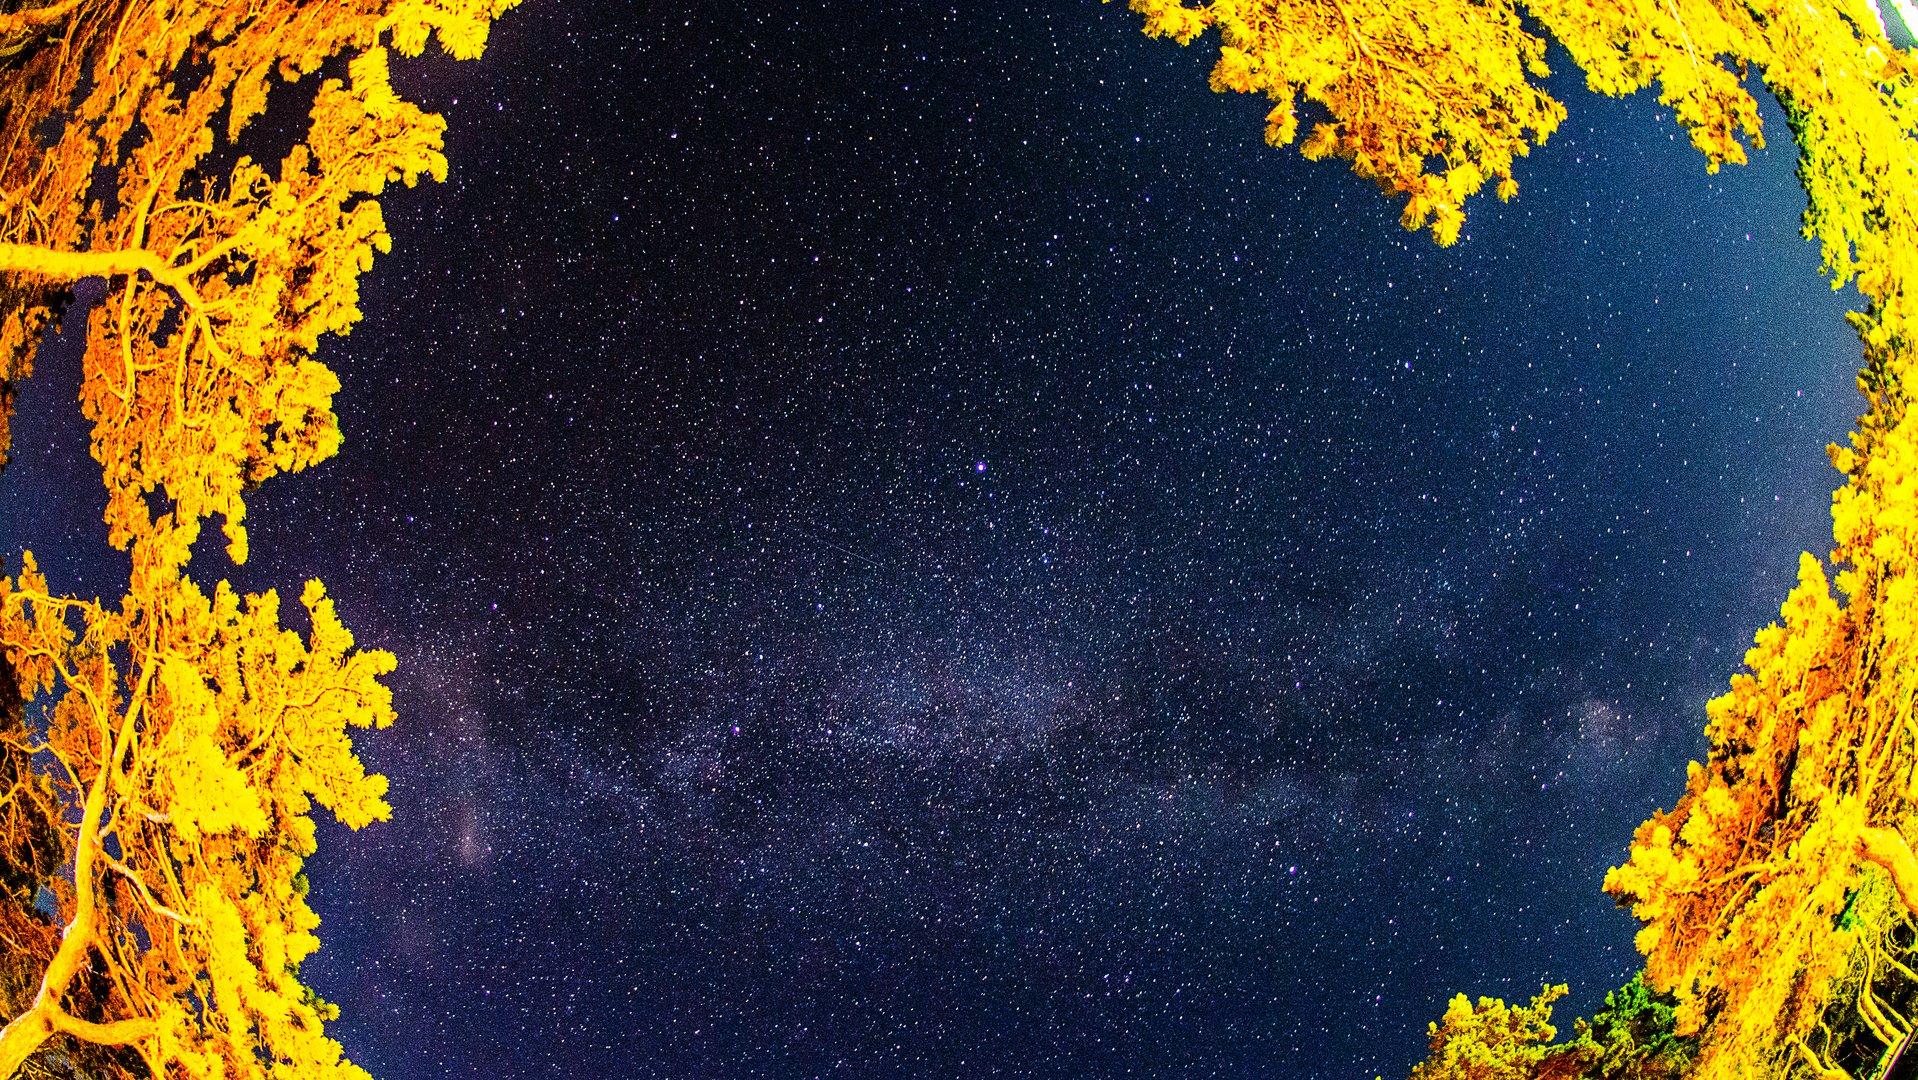 Milkyway above Croatia